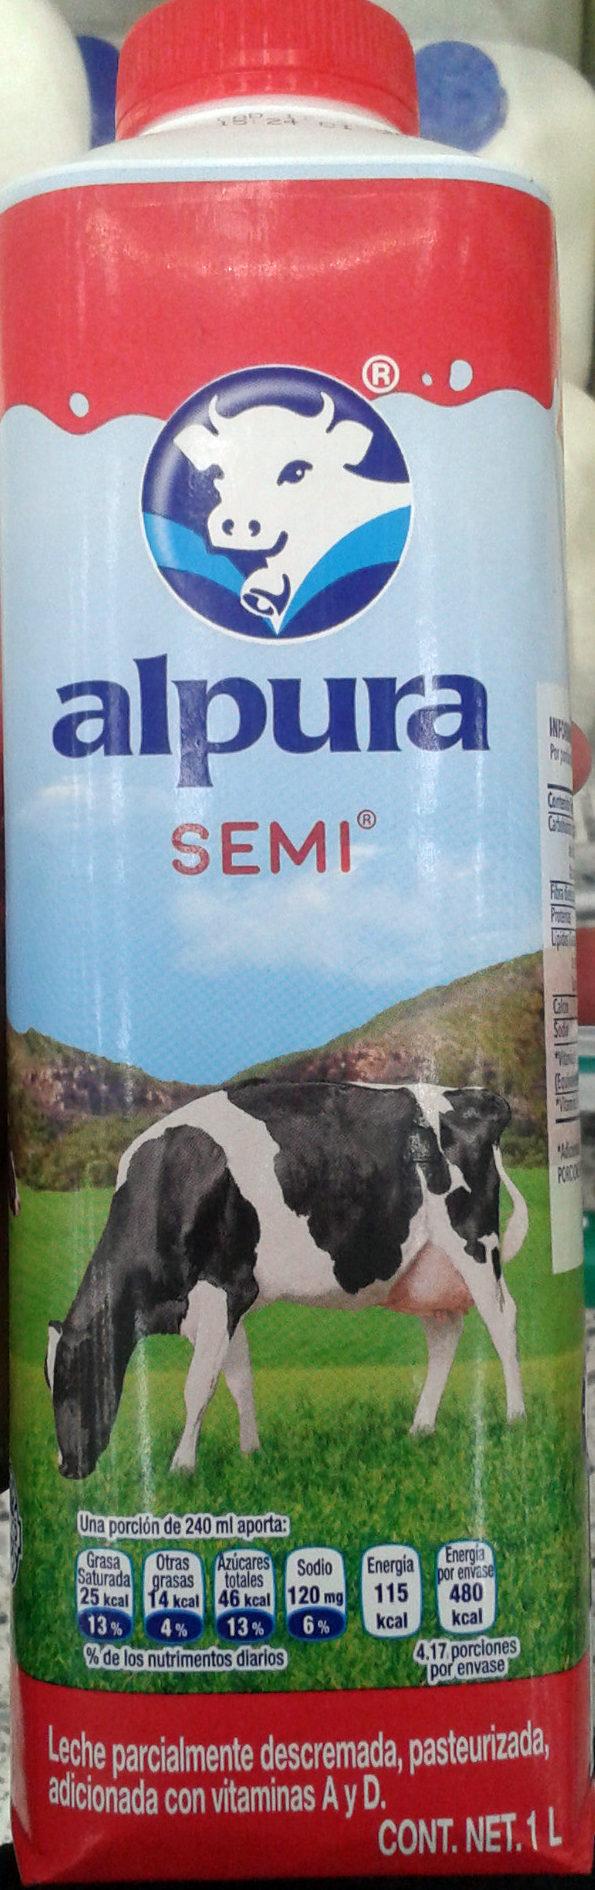 Leche Alpura semi - Product - es